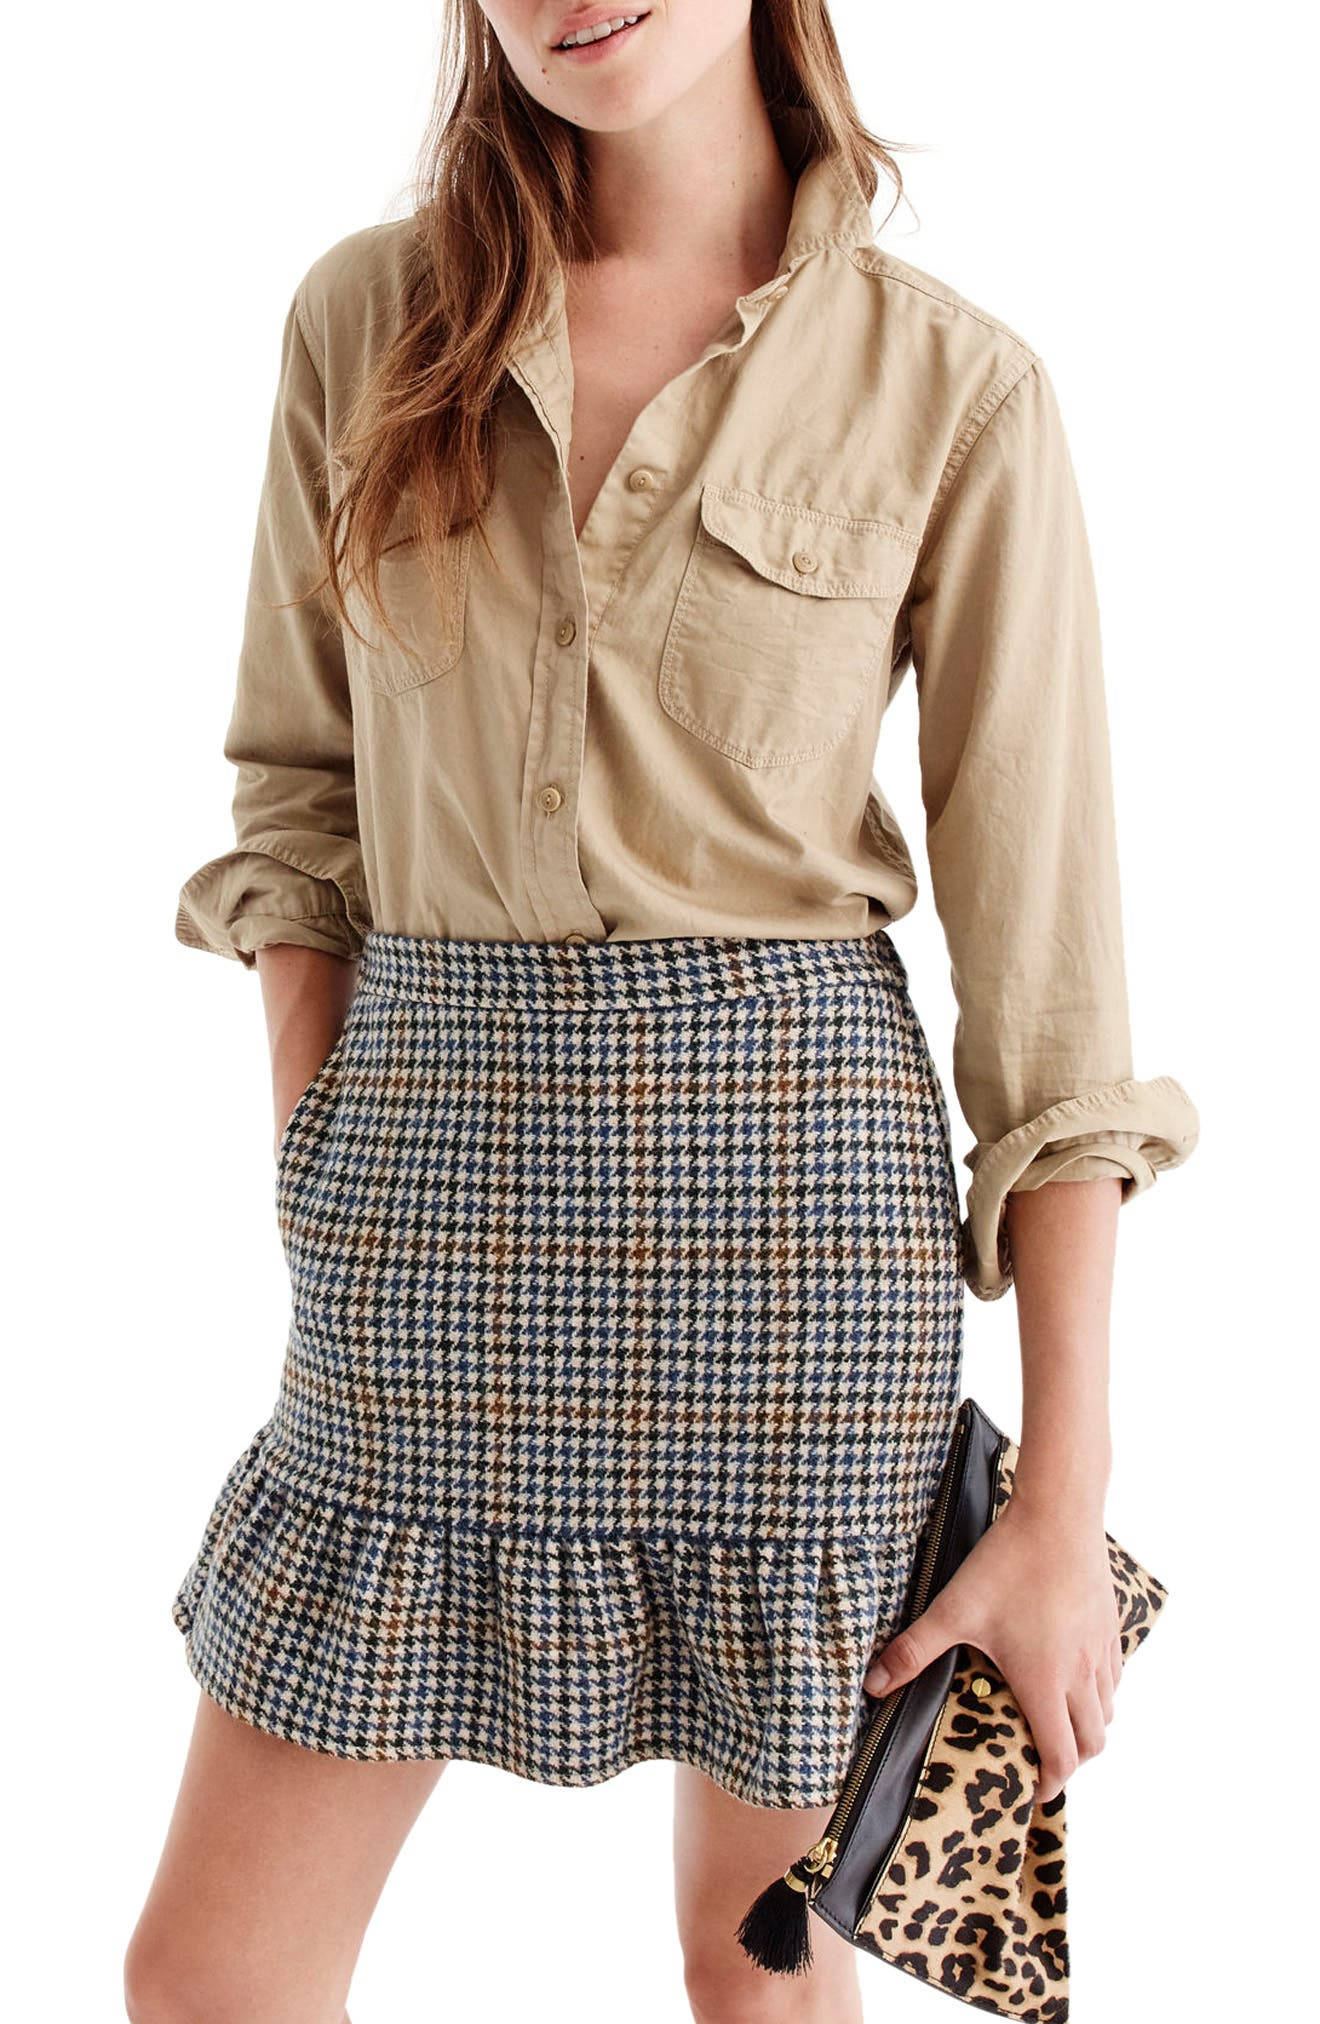 J.Crew Ruffle Houndstooth Miniskirt,                         Main,                         color, Navy/ Brown/ Cream